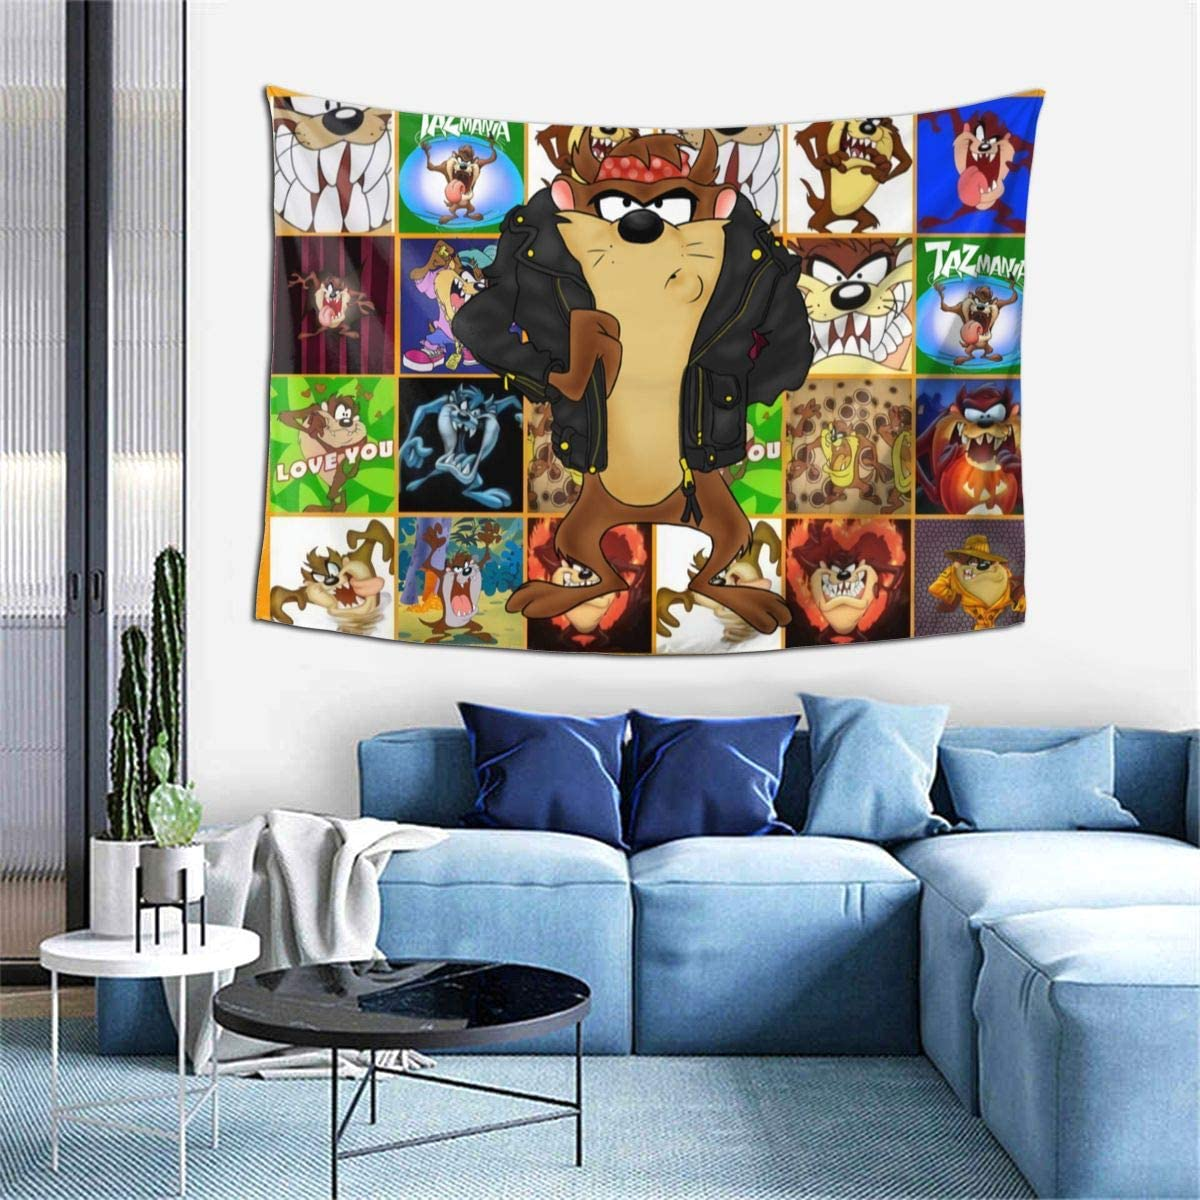 Bestrgi Tapestry Art Wall Hangings 3D Printing Decoration Looney Tunes Tasmanian Devil Taz Wall Art Blanket Living Room Comfort Throw Home Decor for Dorm Bedroom Home Decor 60x40 Inches